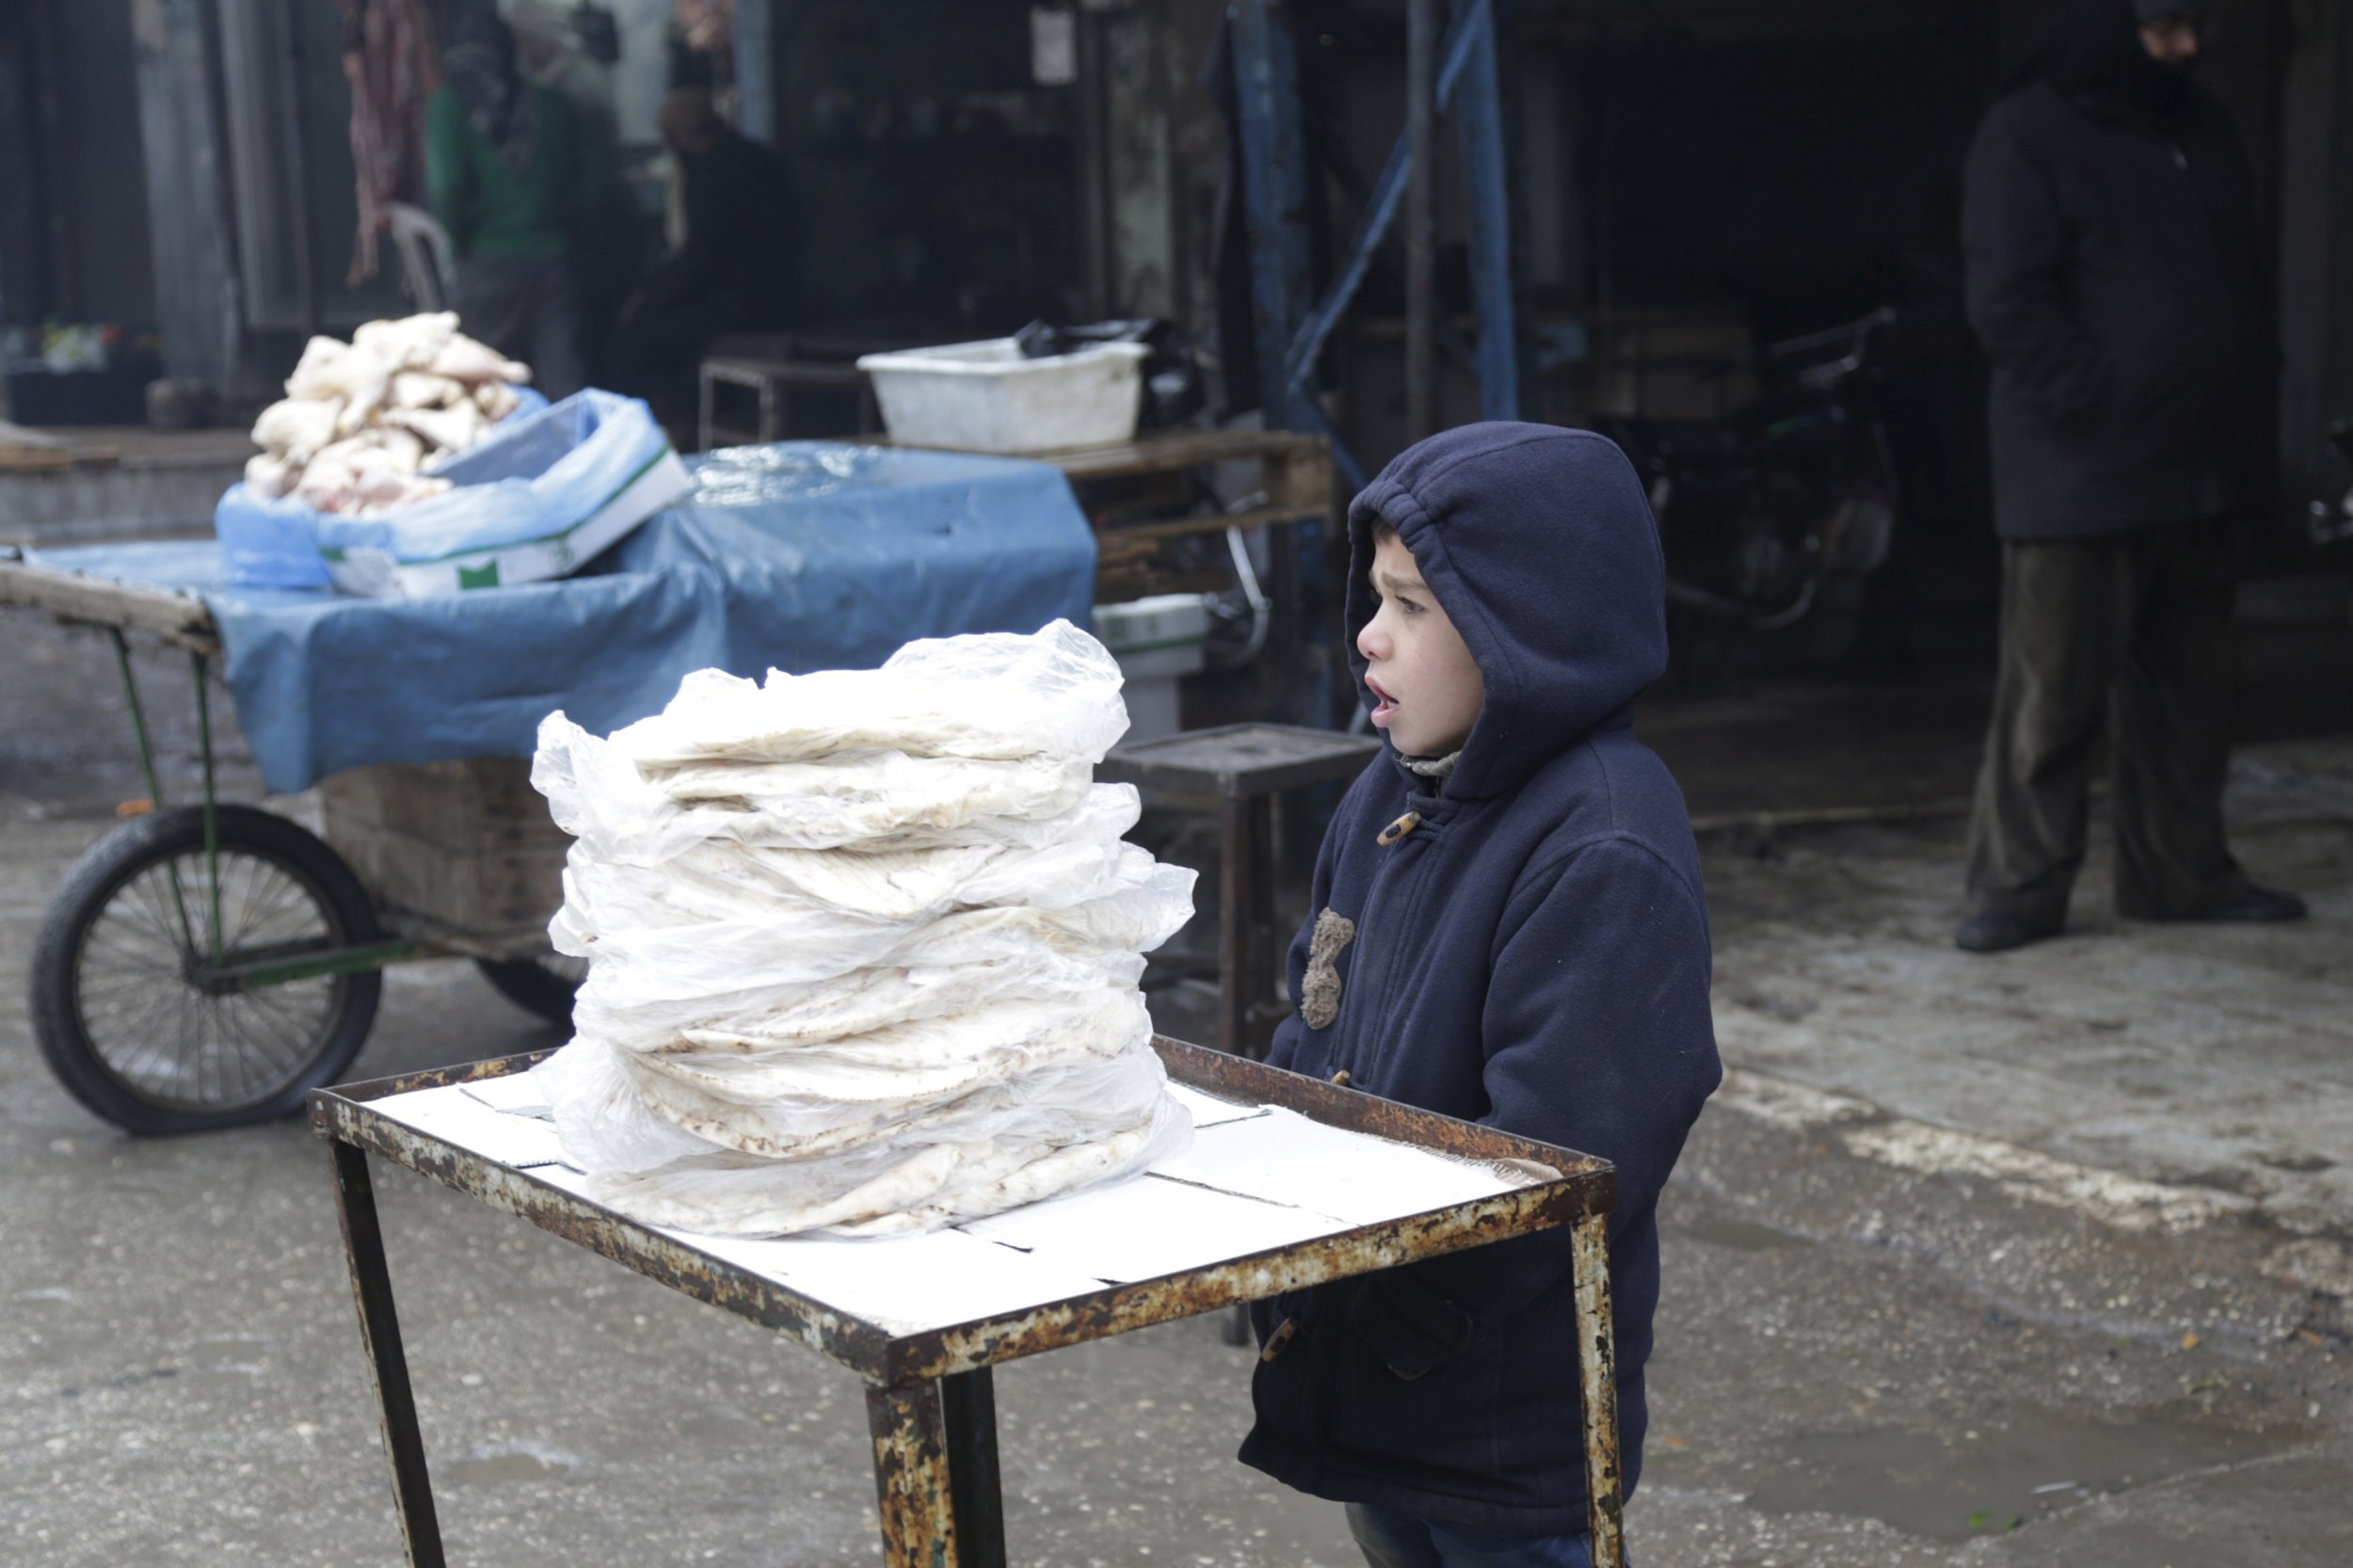 01_23_Syria_Starvation_Sympathy